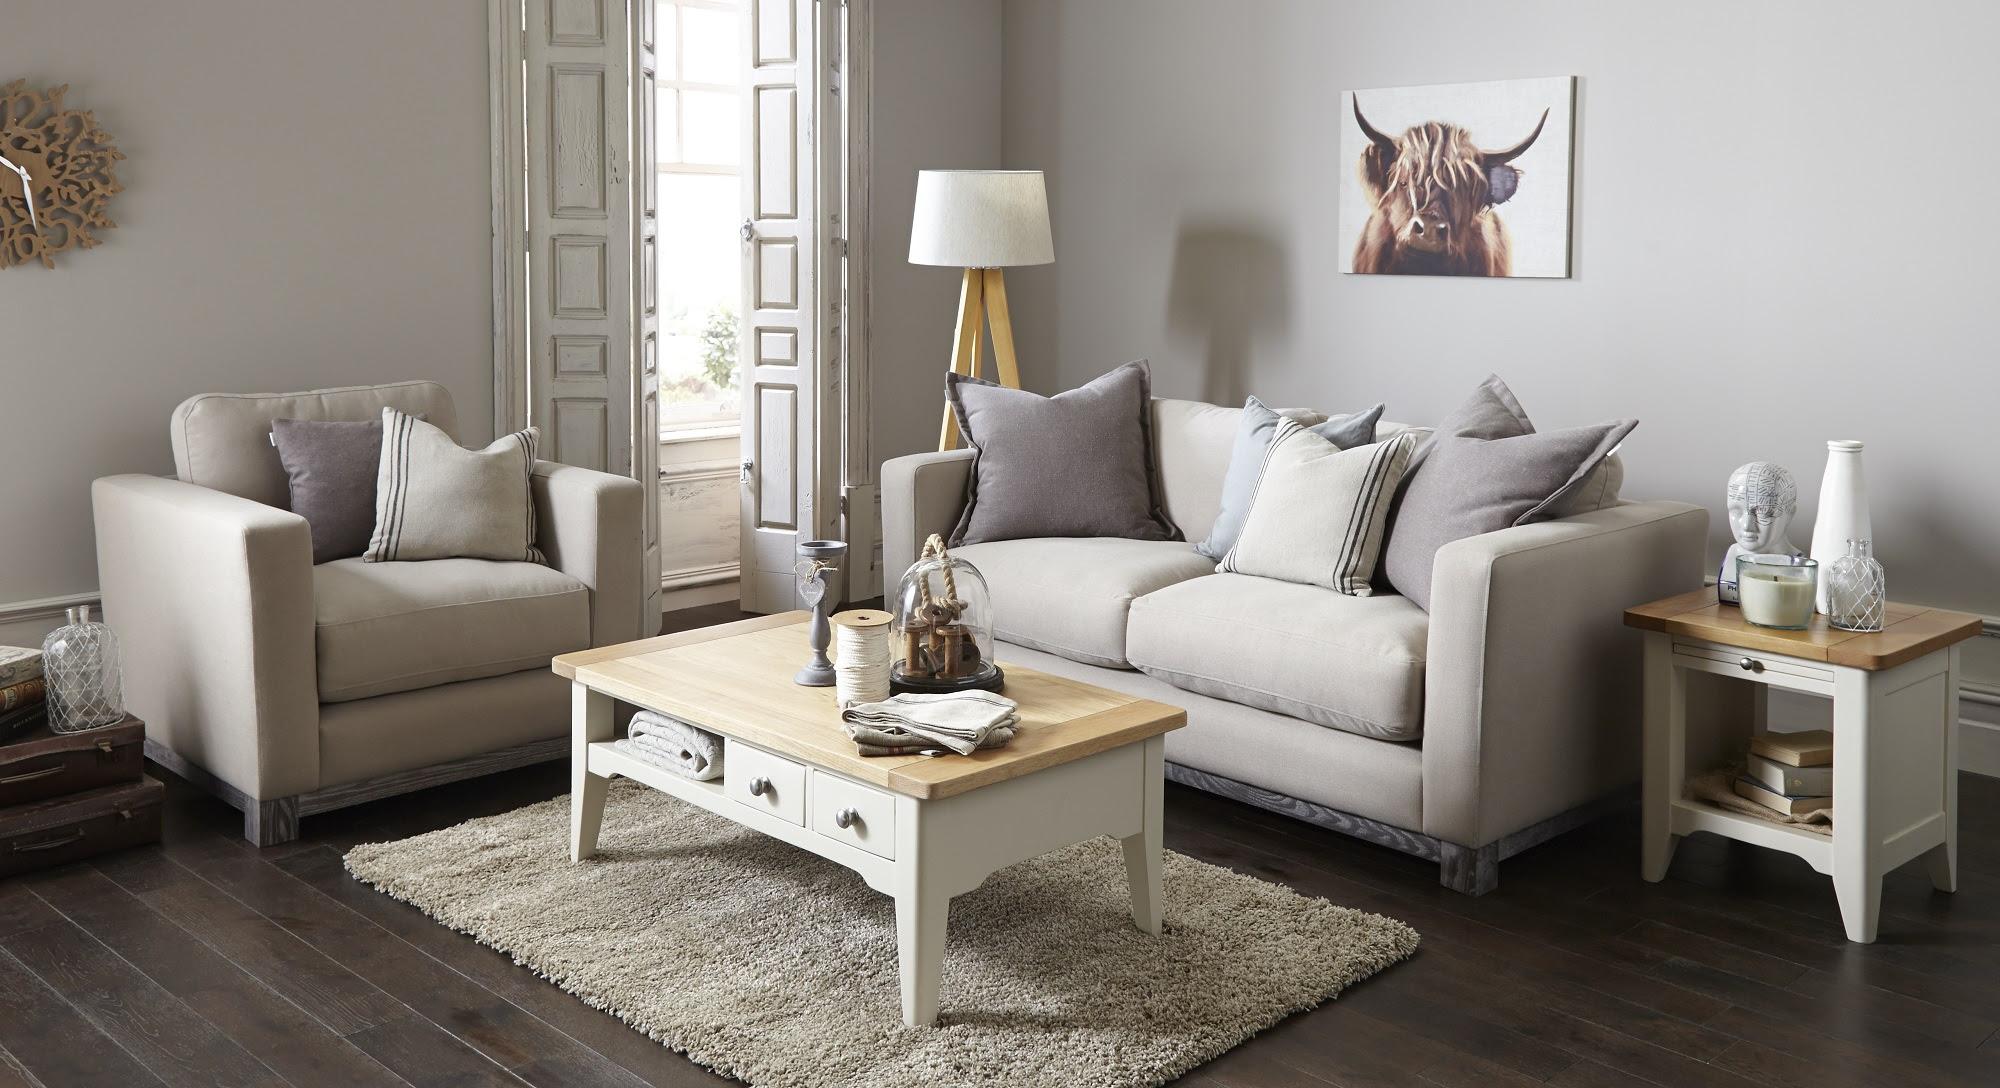 John lewis living room designs | Hawk Haven